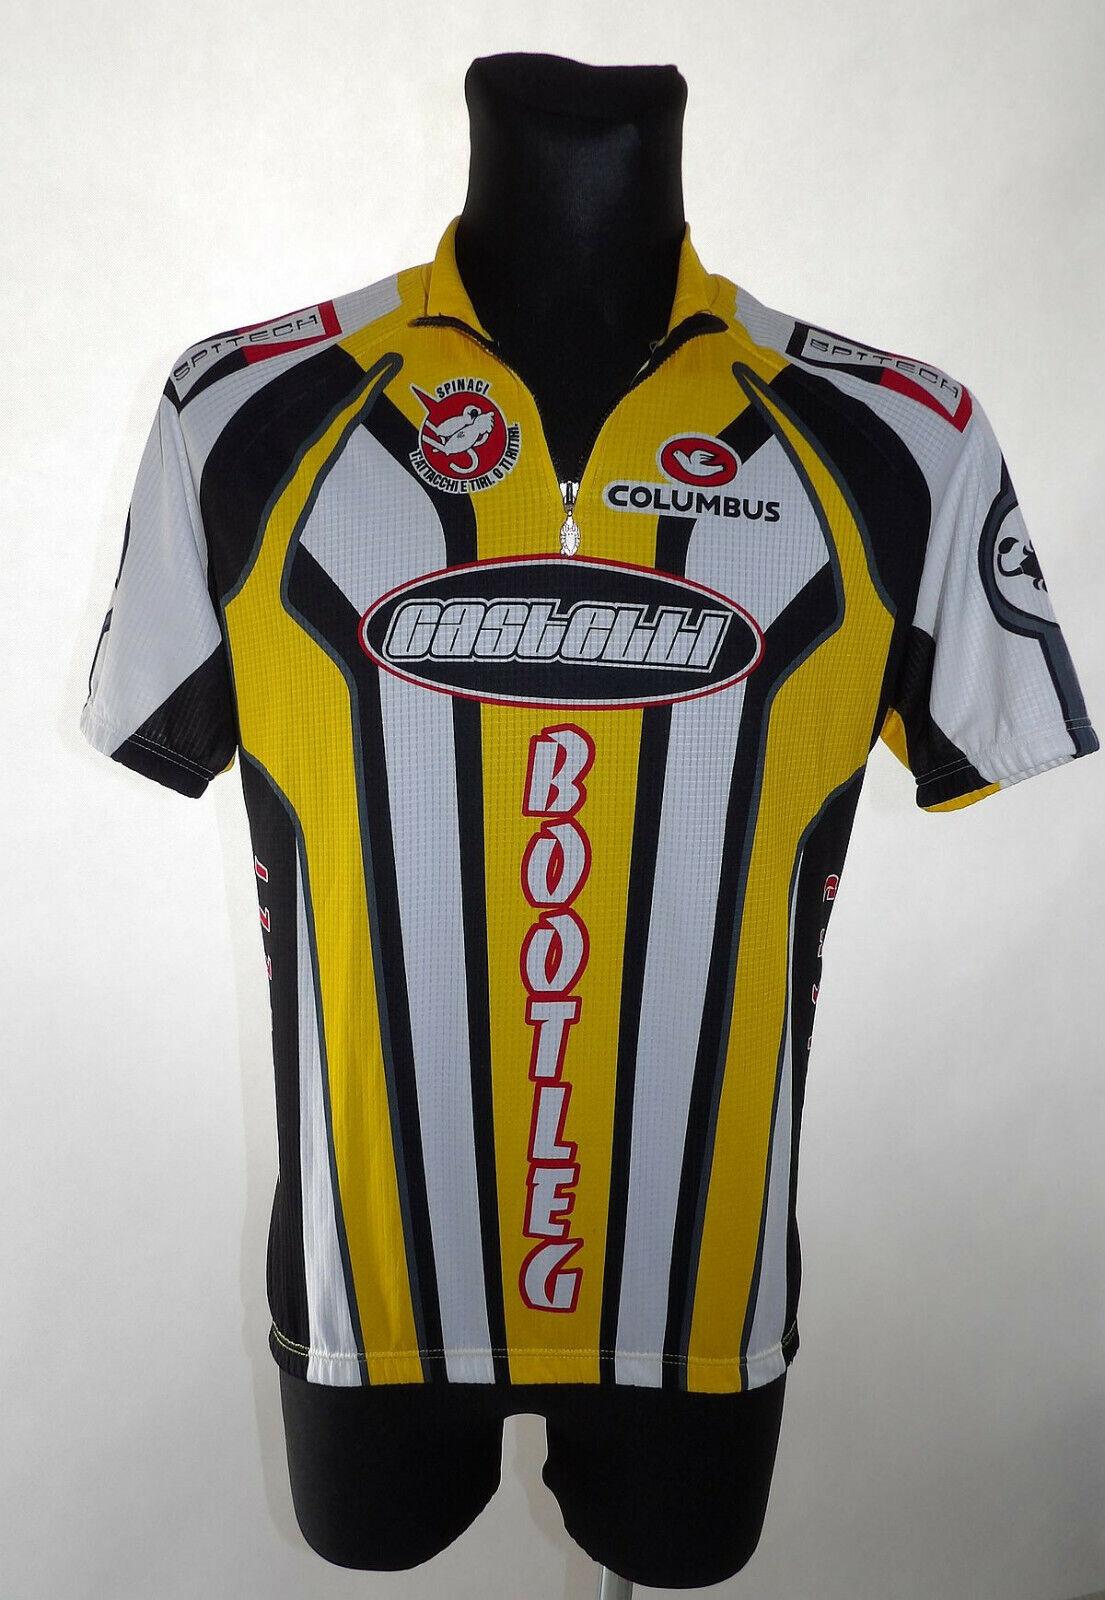 Calumbus Bootleg  XL  Castelli Maglia Cycling Shirt Trikot Jersey